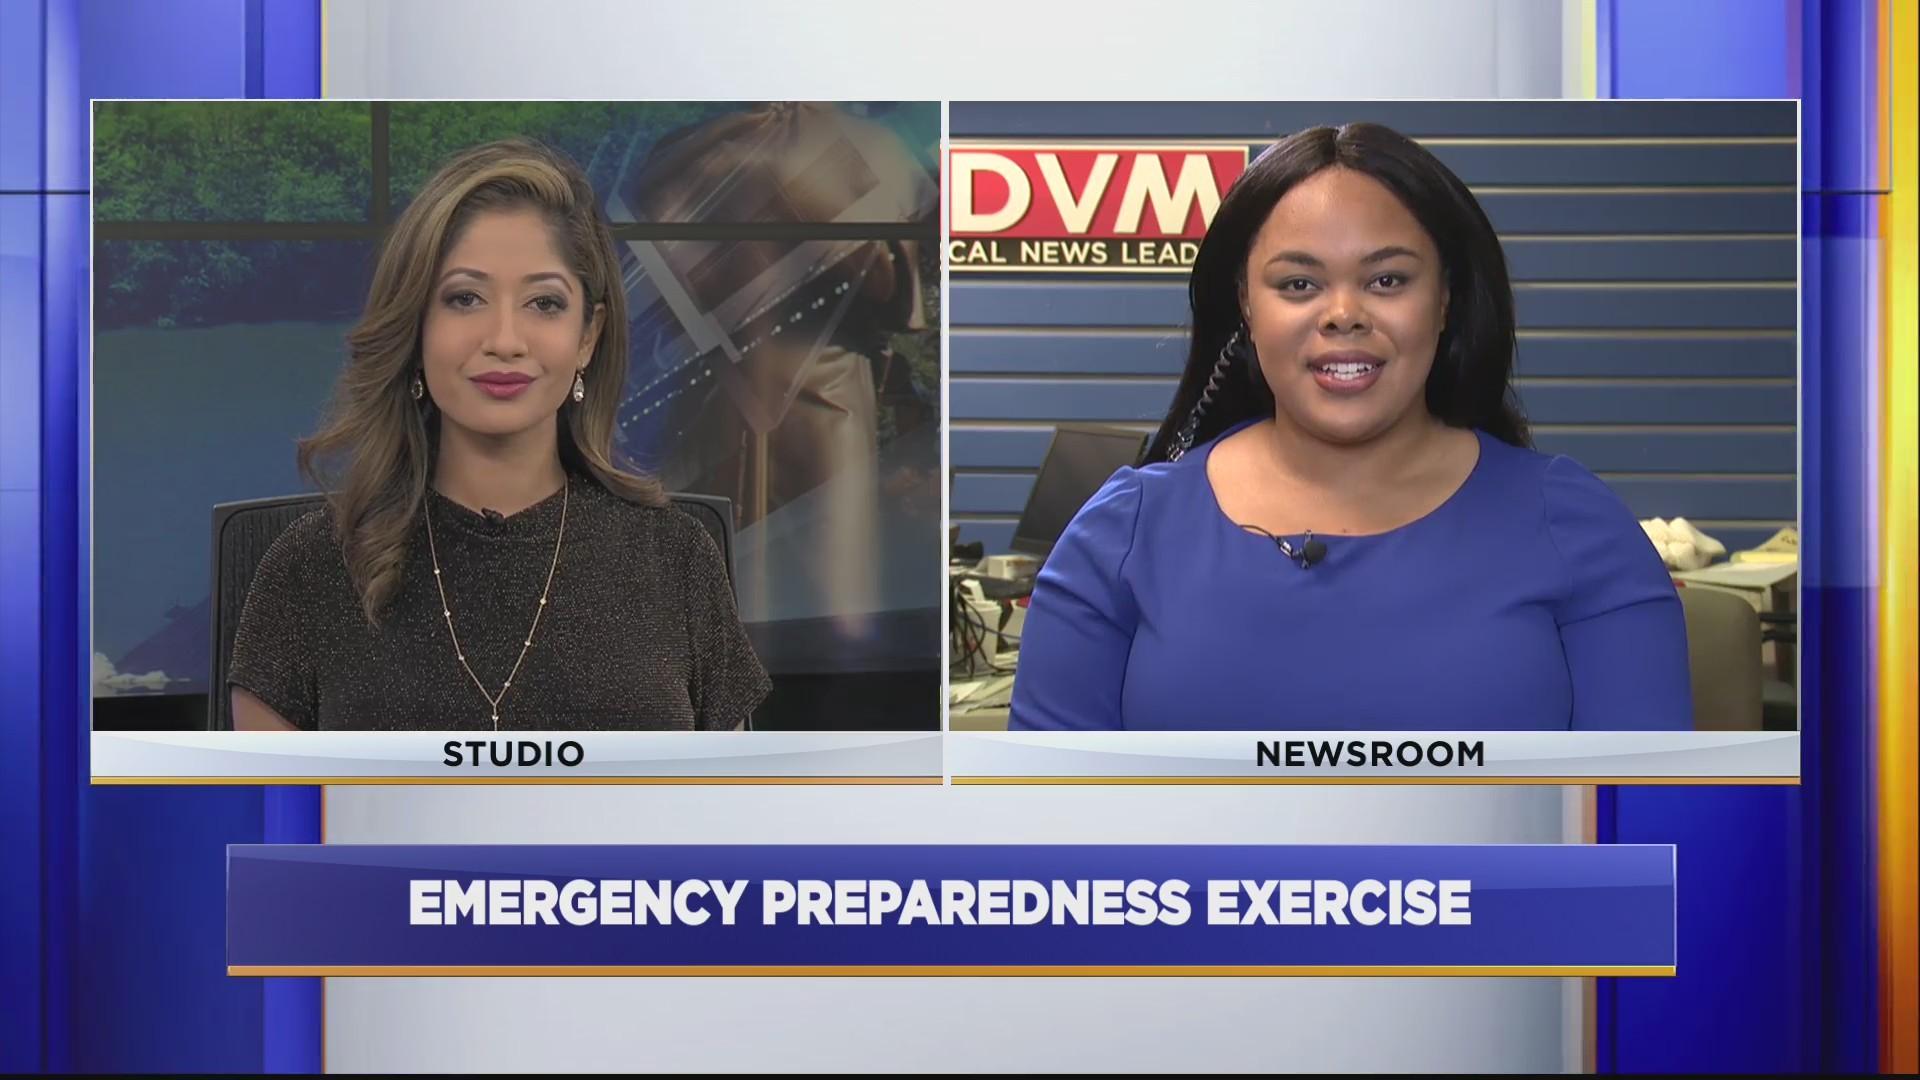 Emergency_preparedness_exercise_0_20190207231946